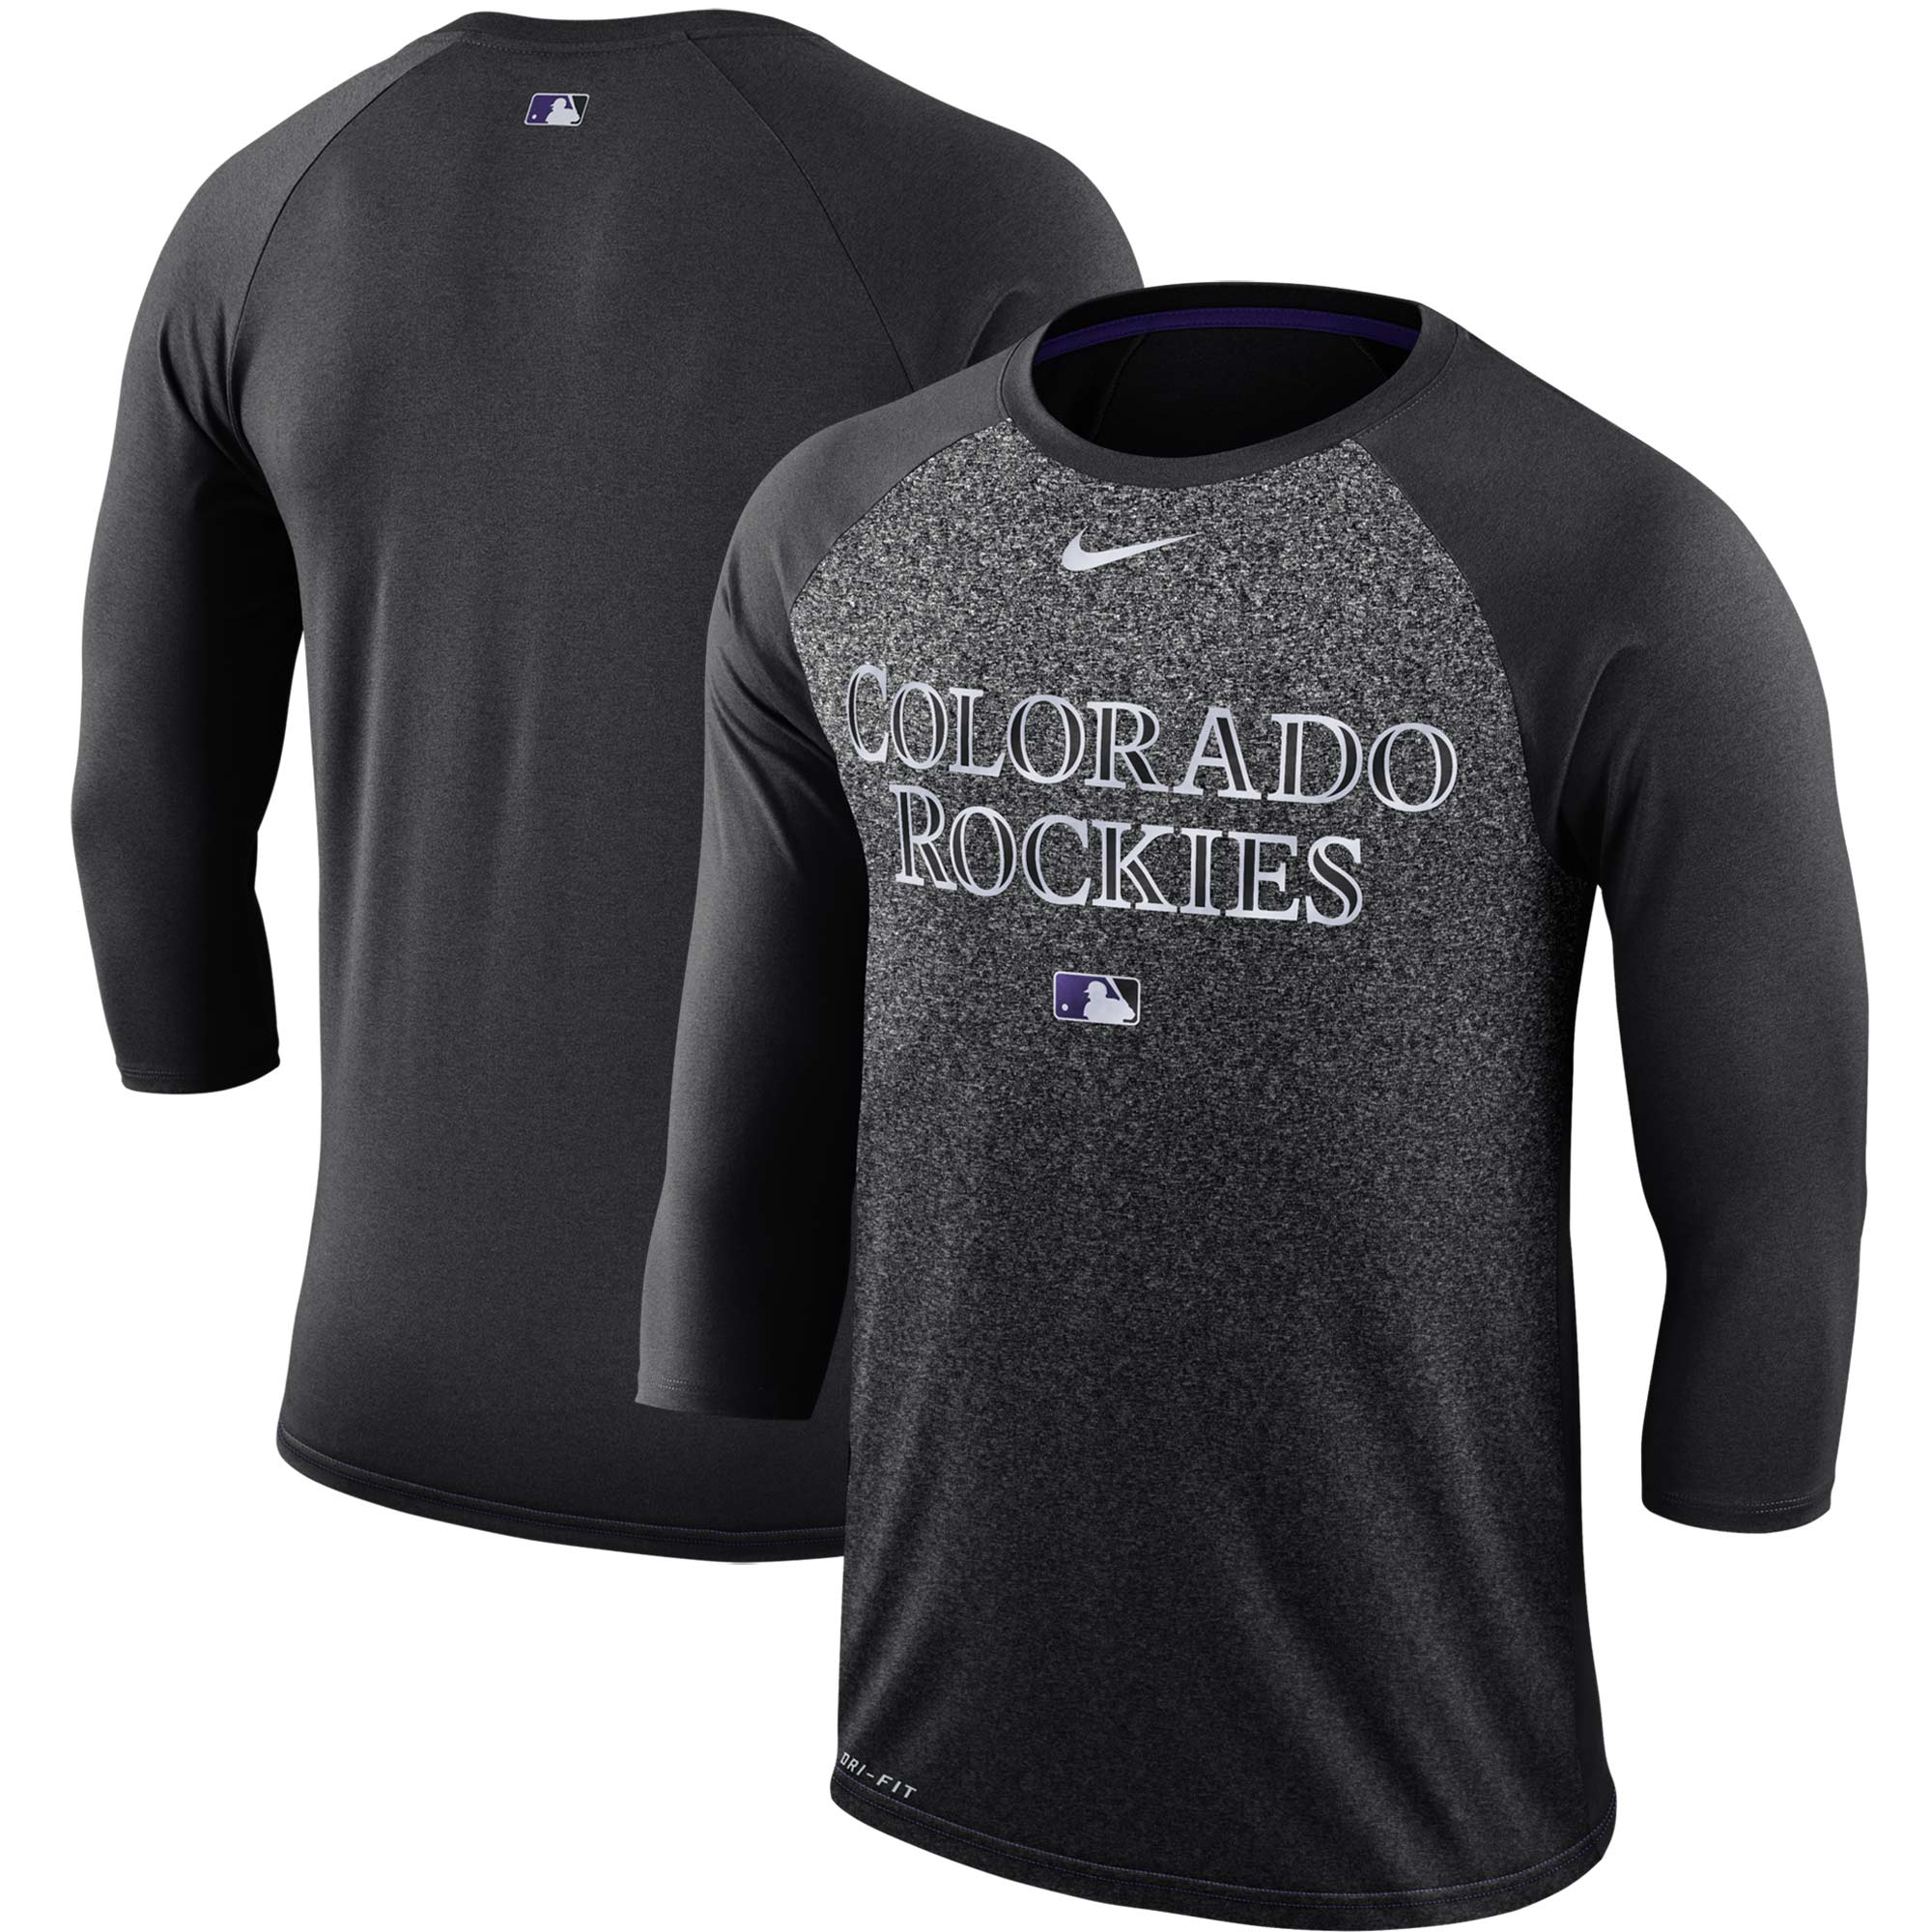 Colorado Rockies Nike Authentic Collection Legend 3/4-Sleeve Raglan Performance T-Shirt - Black